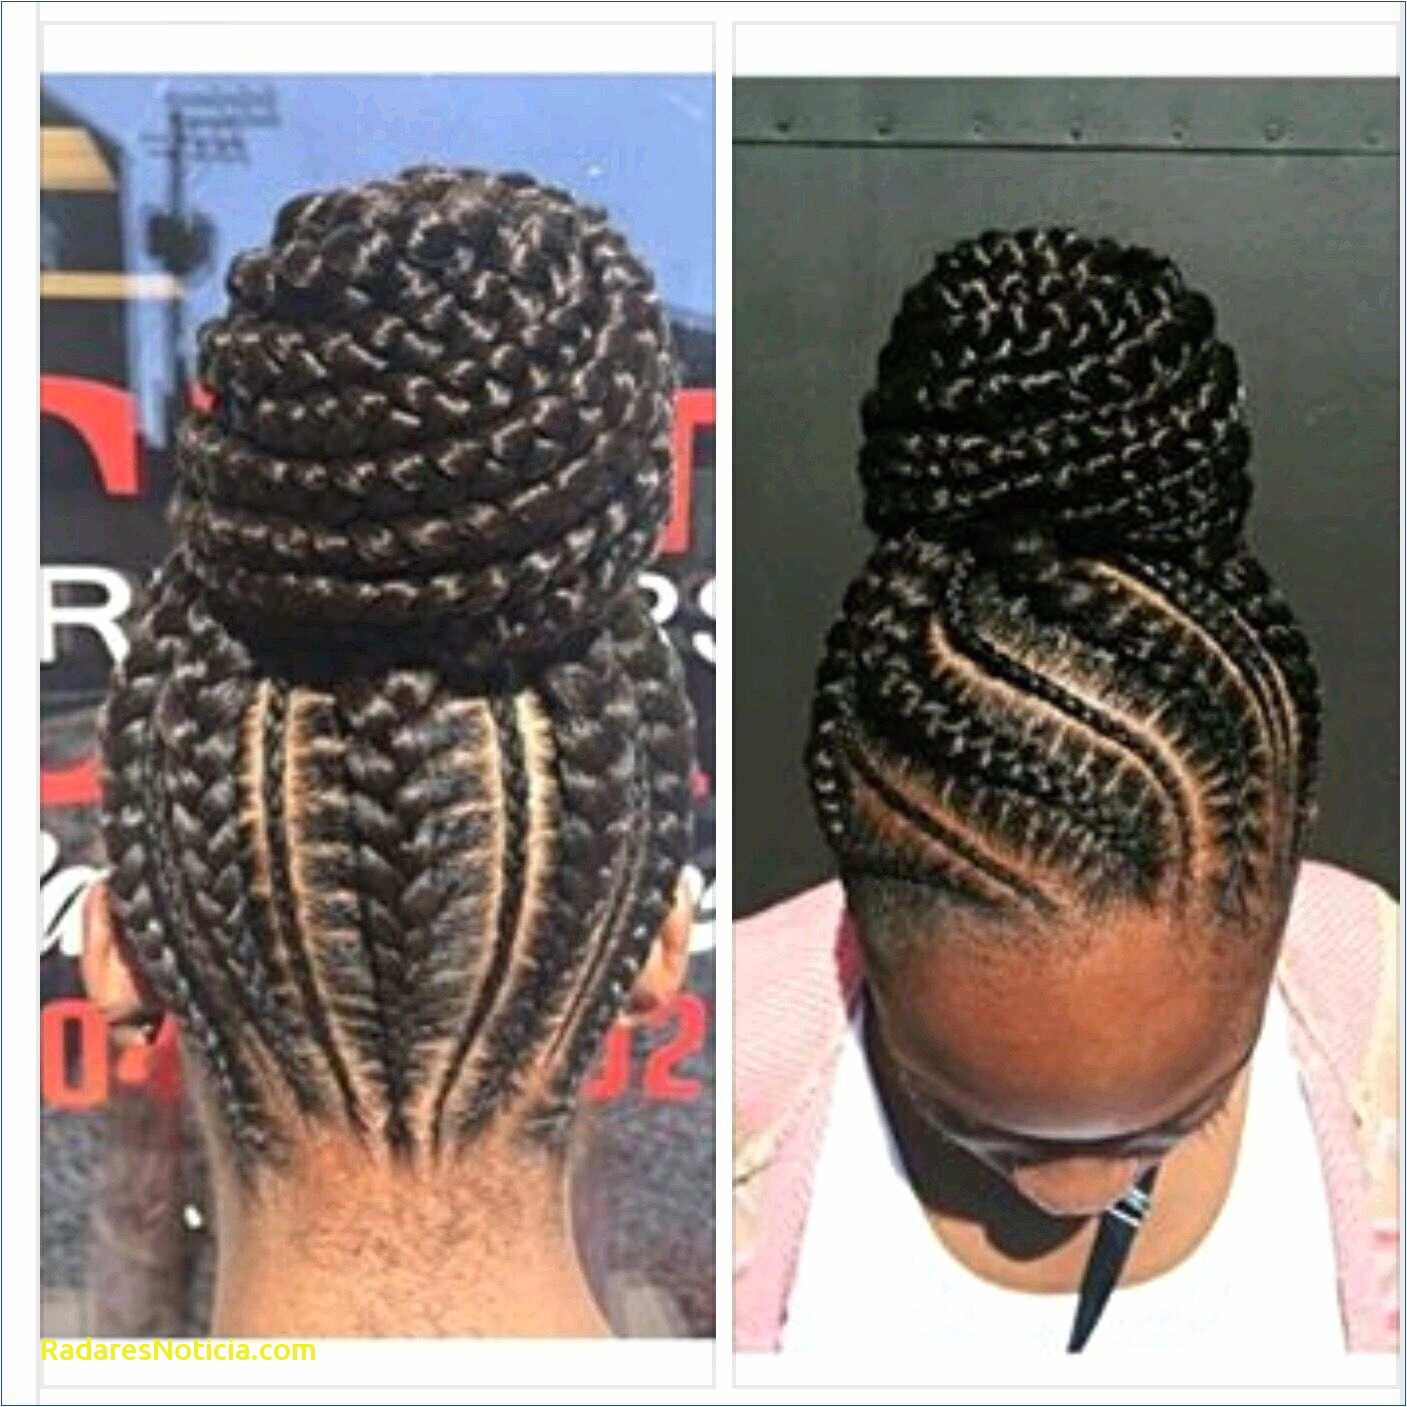 Braided Updo Hairstyles Braided Updo Hairstyles for Black Women Inspirational Pin Od